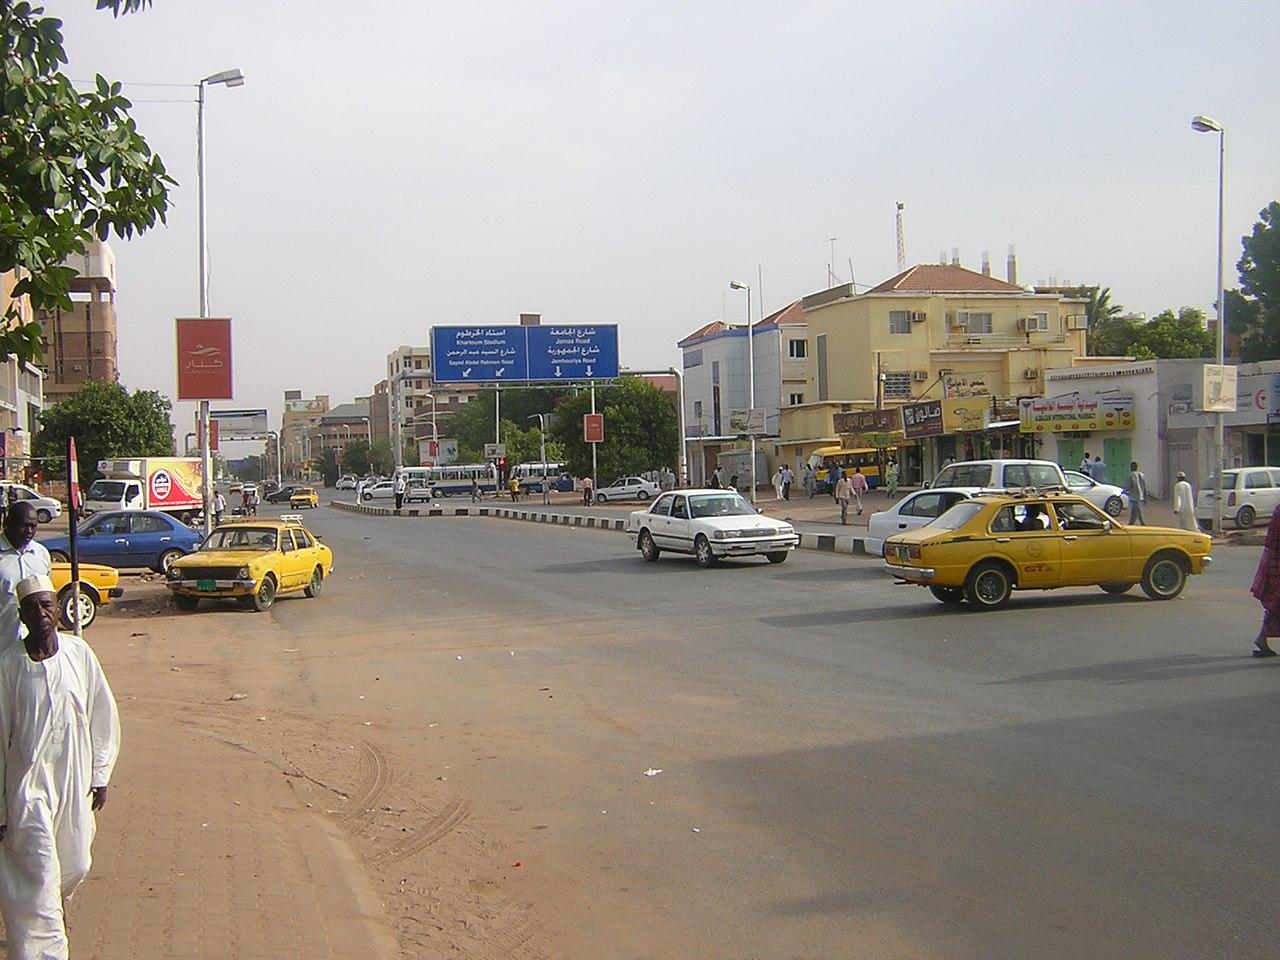 Chartúm sudan